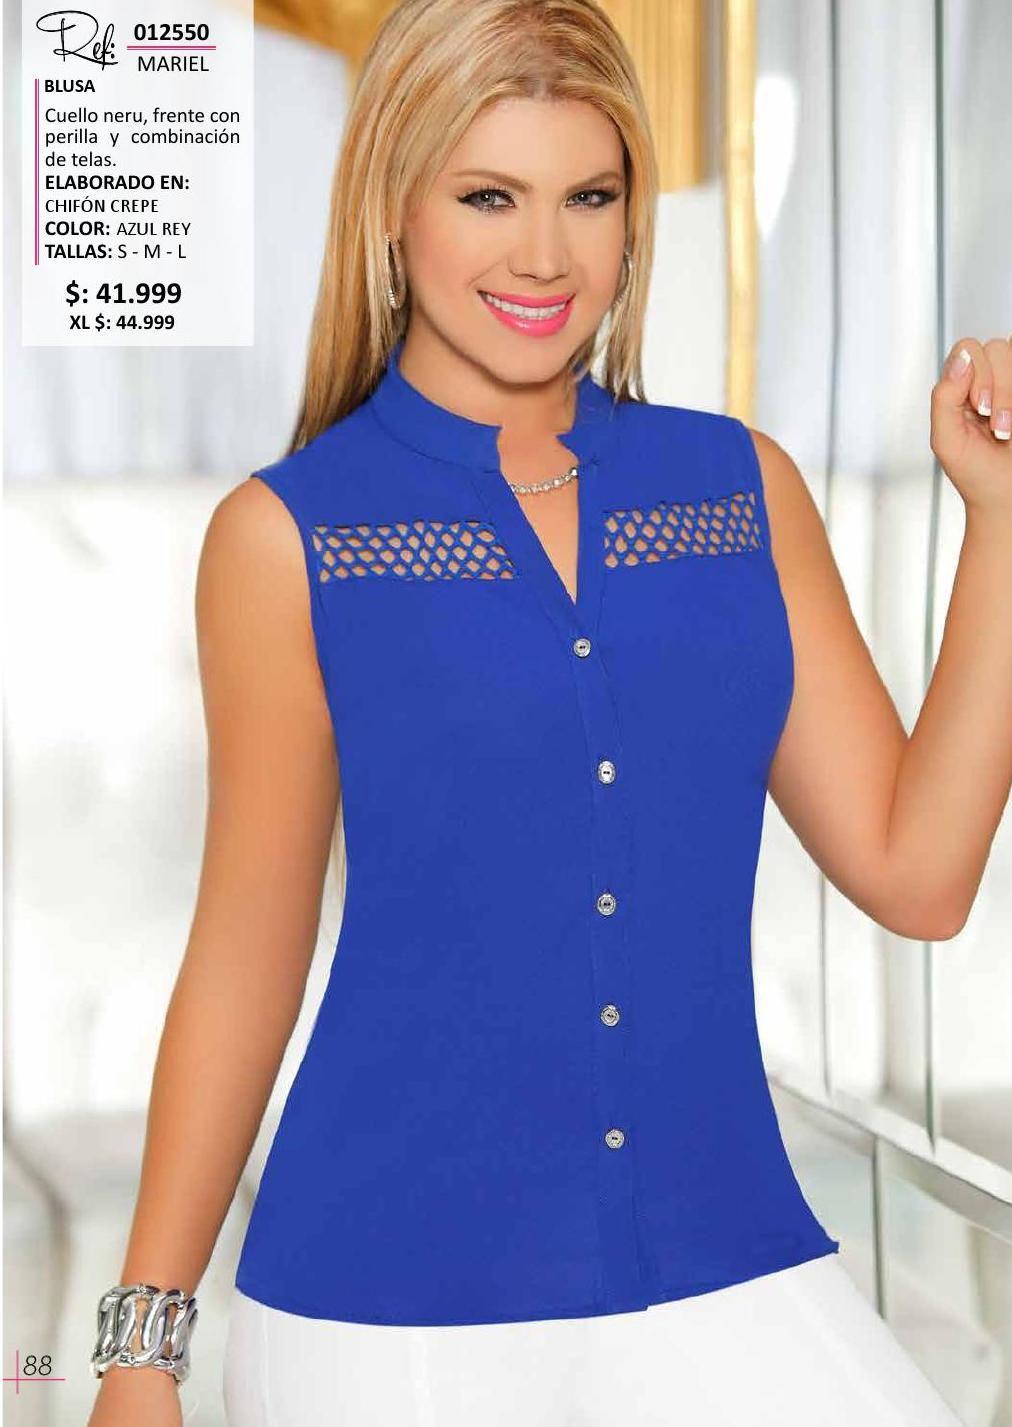 Bbl Edicion 32 Blusas Femininas Modelo De Blusas Sociais Saias Pretas Curtas